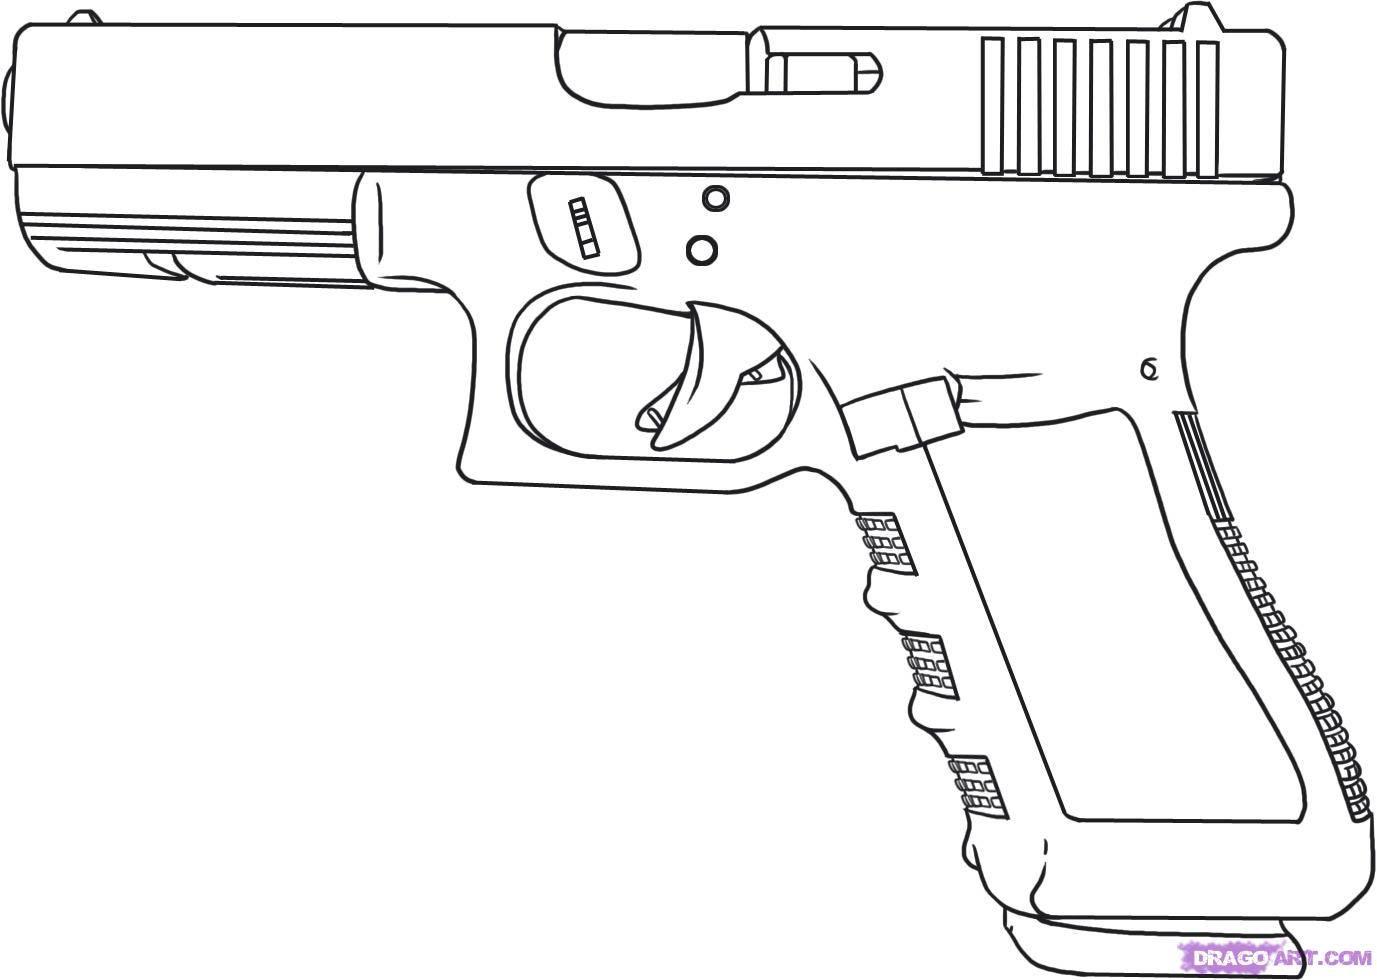 Drawn weapon coin gun Drawings Gun Draw Gun pictures